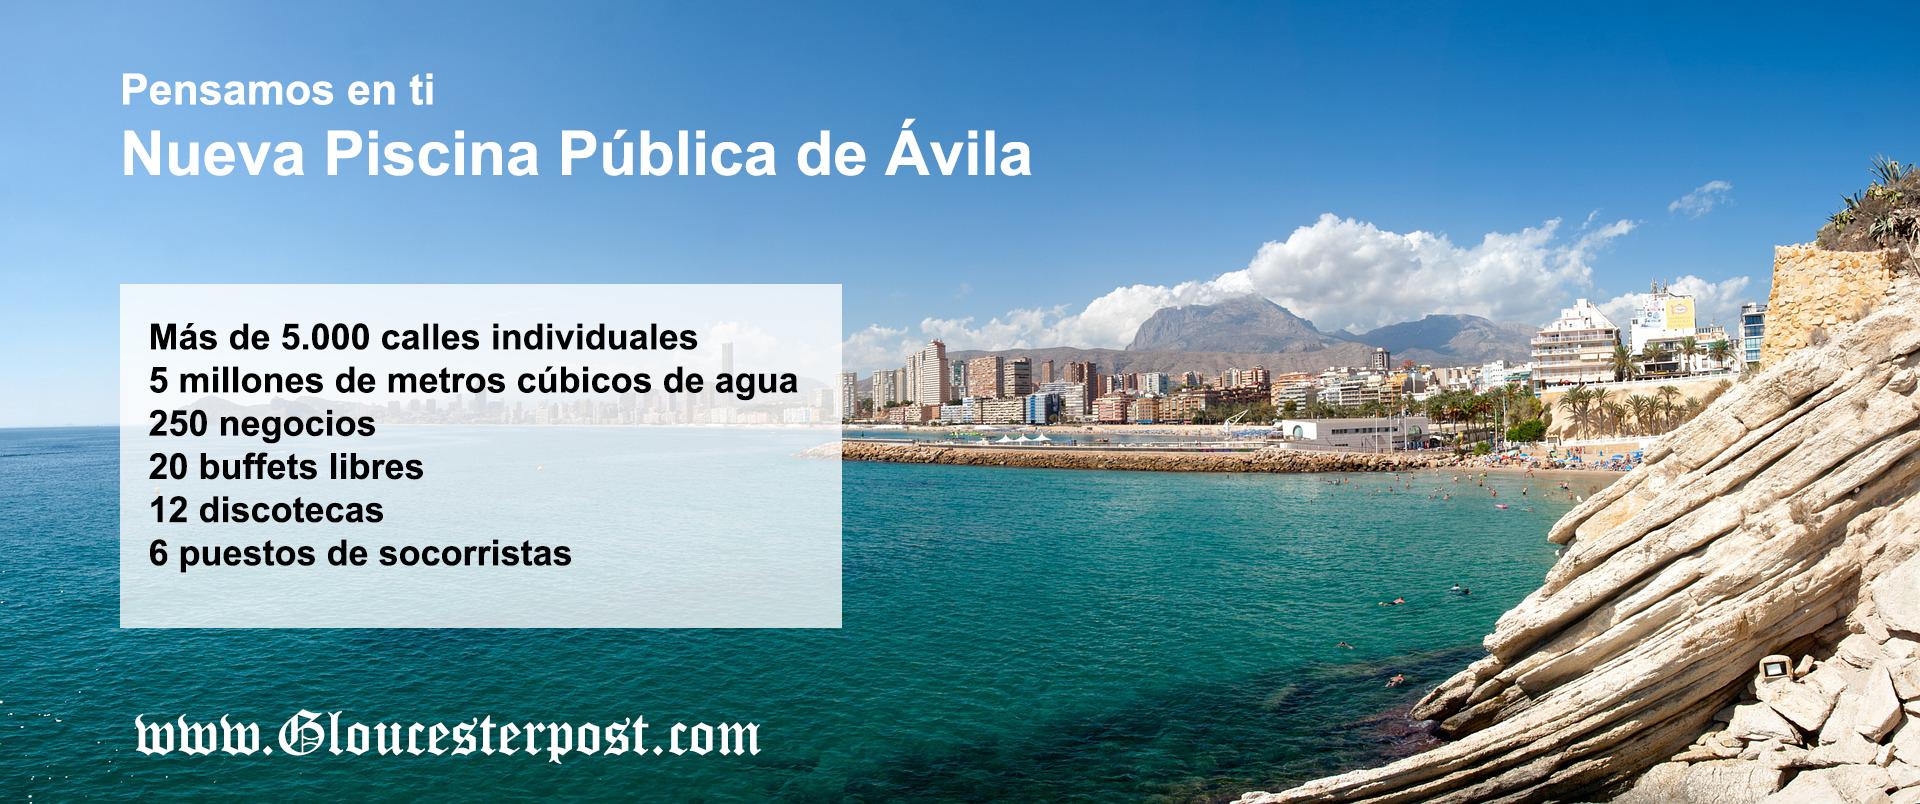 Piscina pública de Ávila